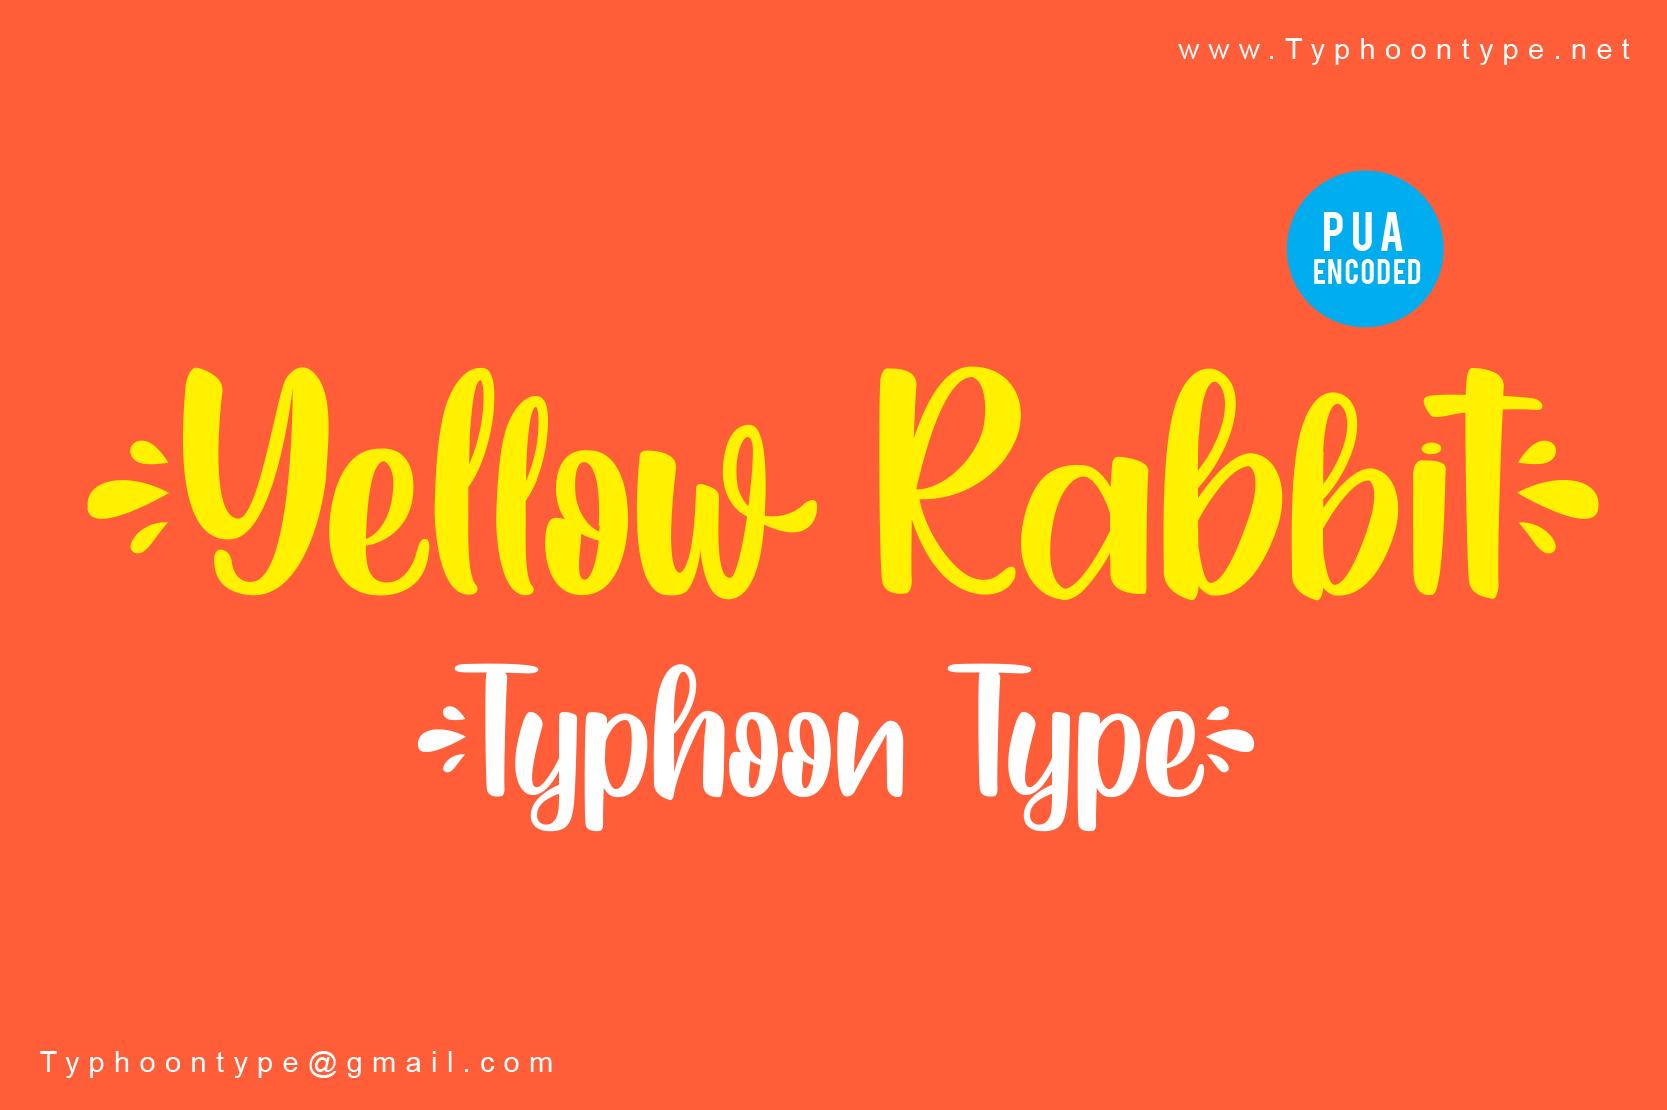 Yellow-Rabbit-Fonts-4201924-1-1